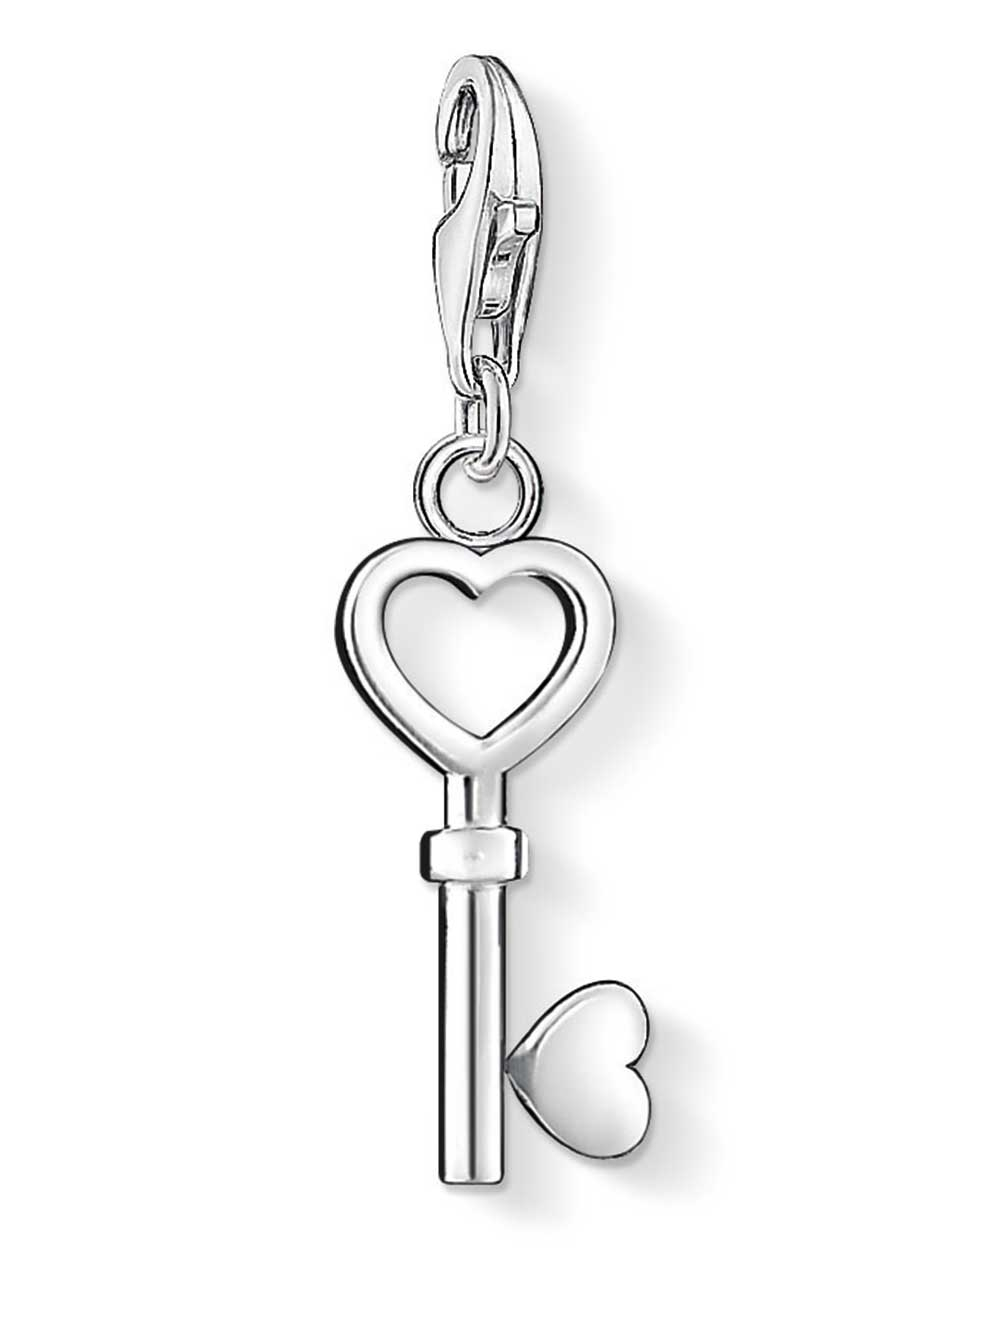 Thomas Sabo 0888-001-12 Charm Anhänger Schlüssel